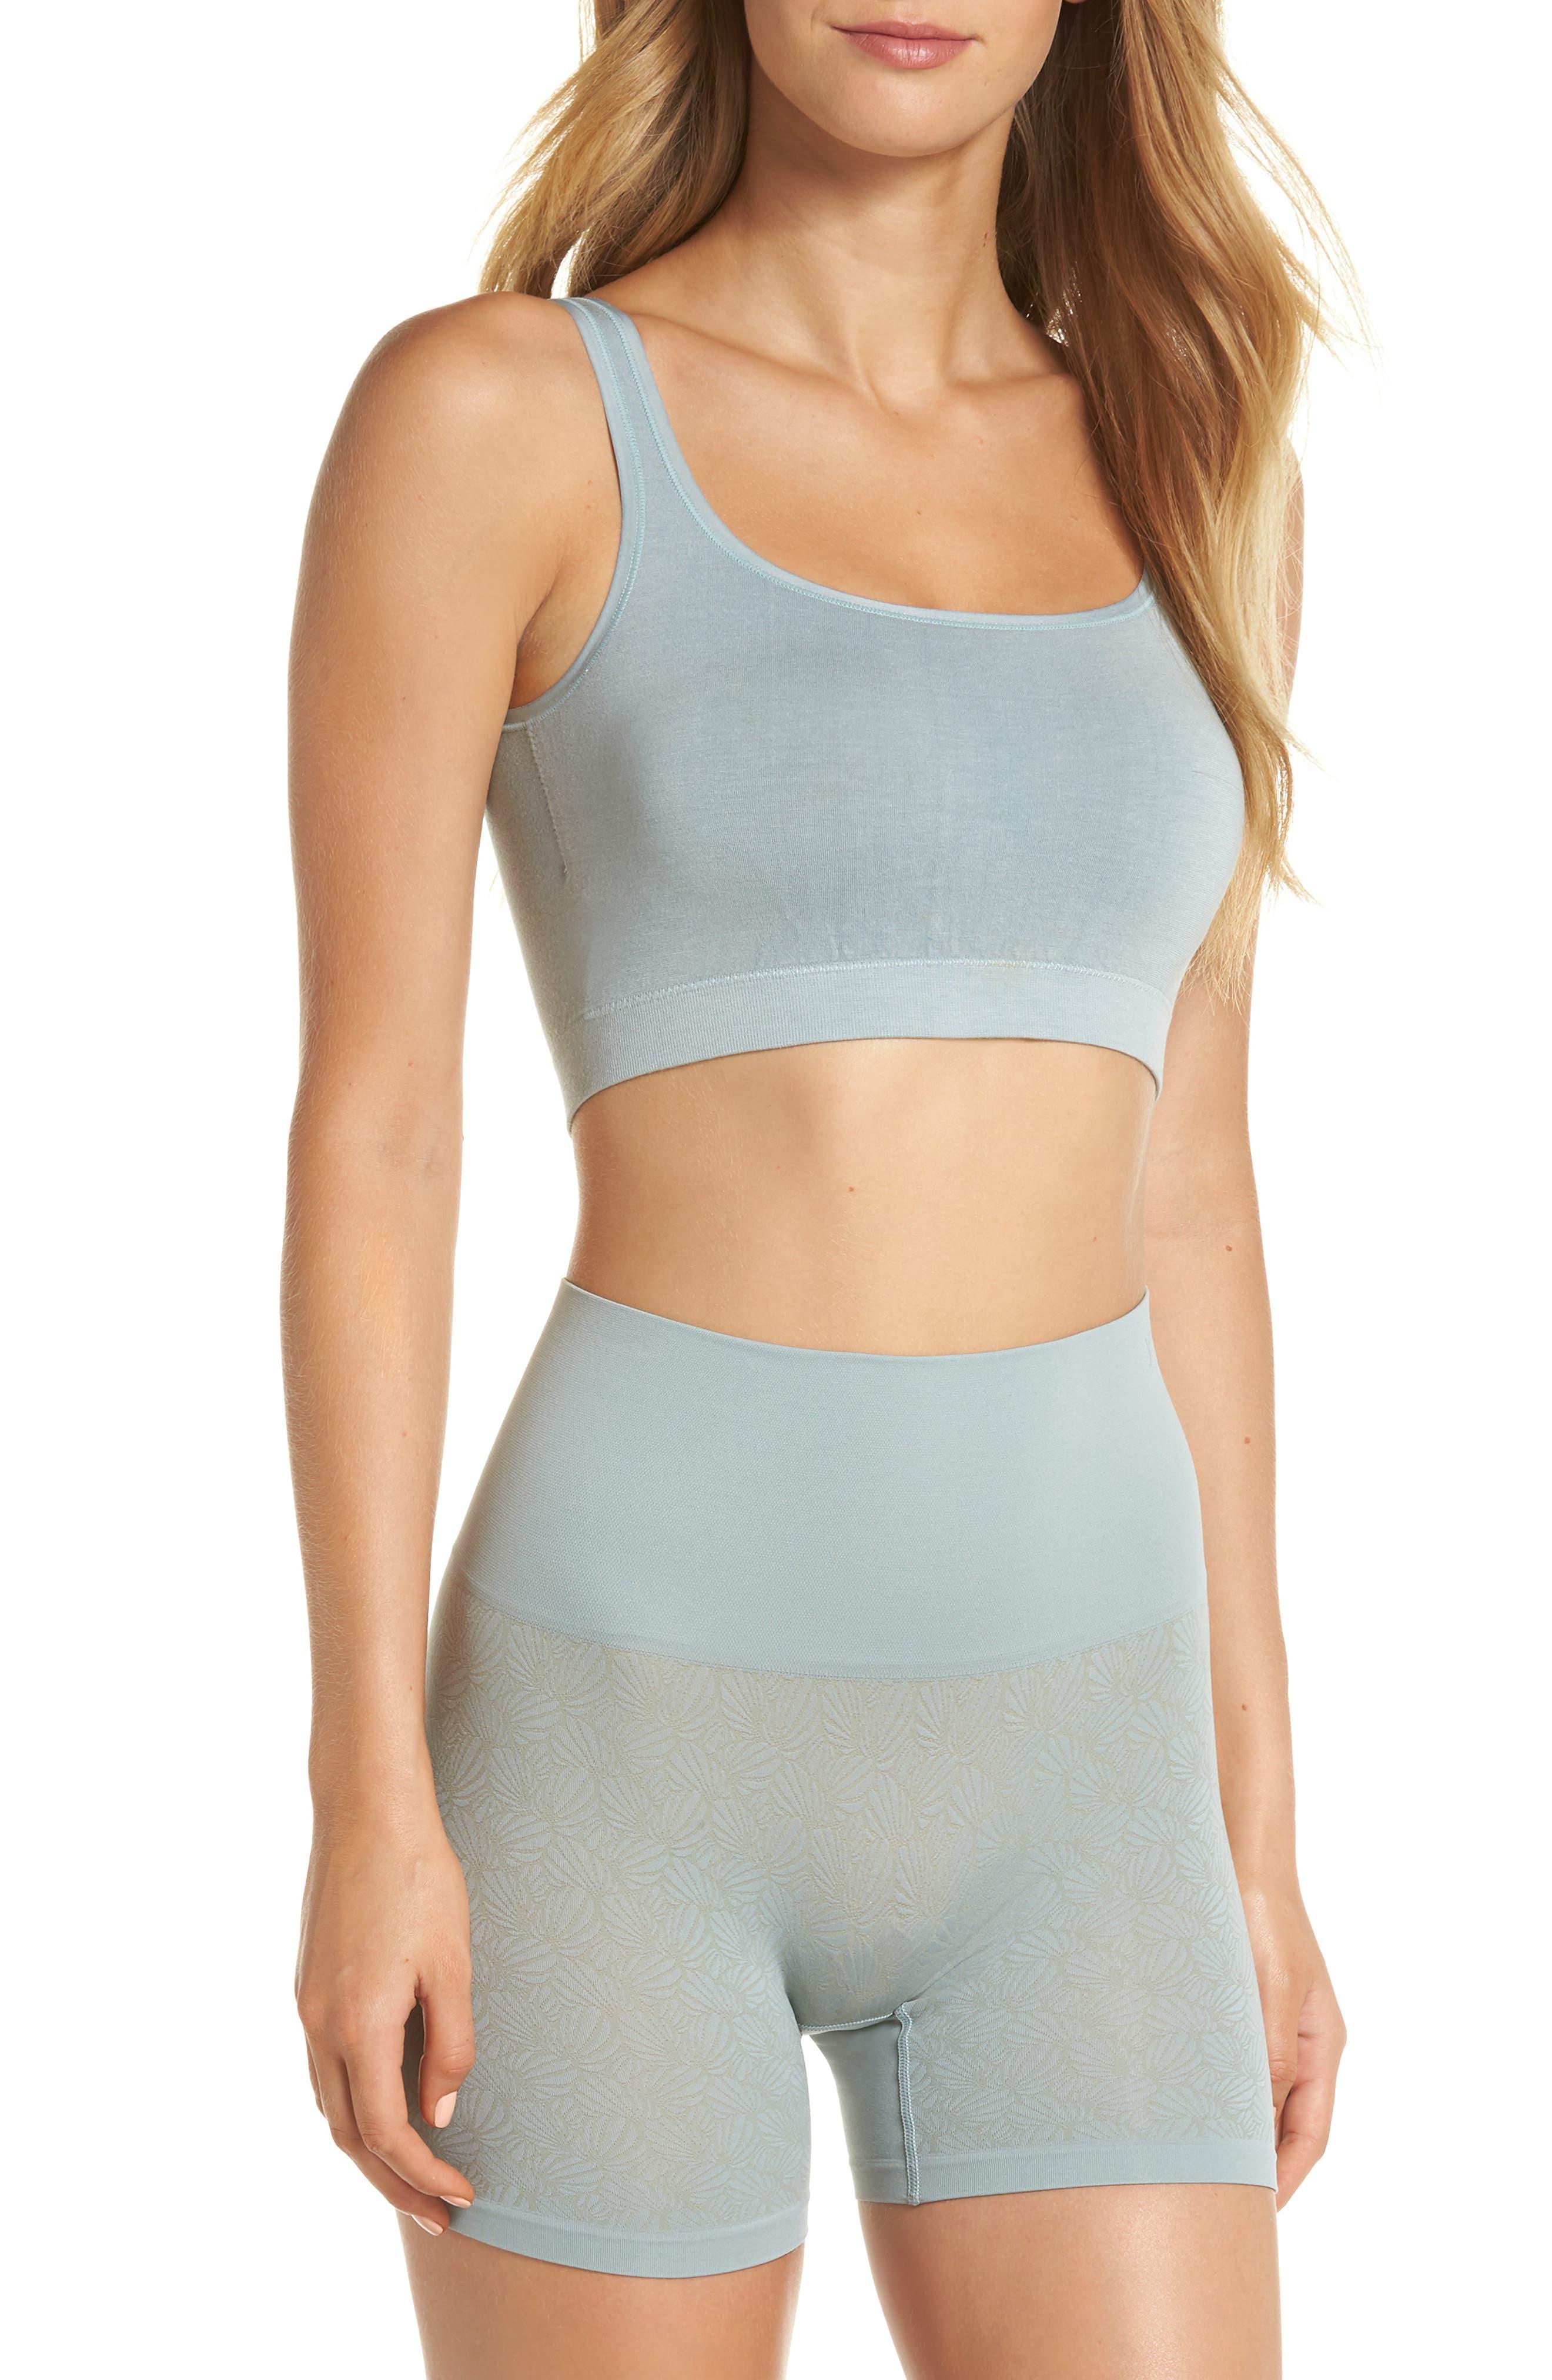 Ultralight Seamless Shaping Shorts,                             Alternate thumbnail 7, color,                             SILVER BLUE